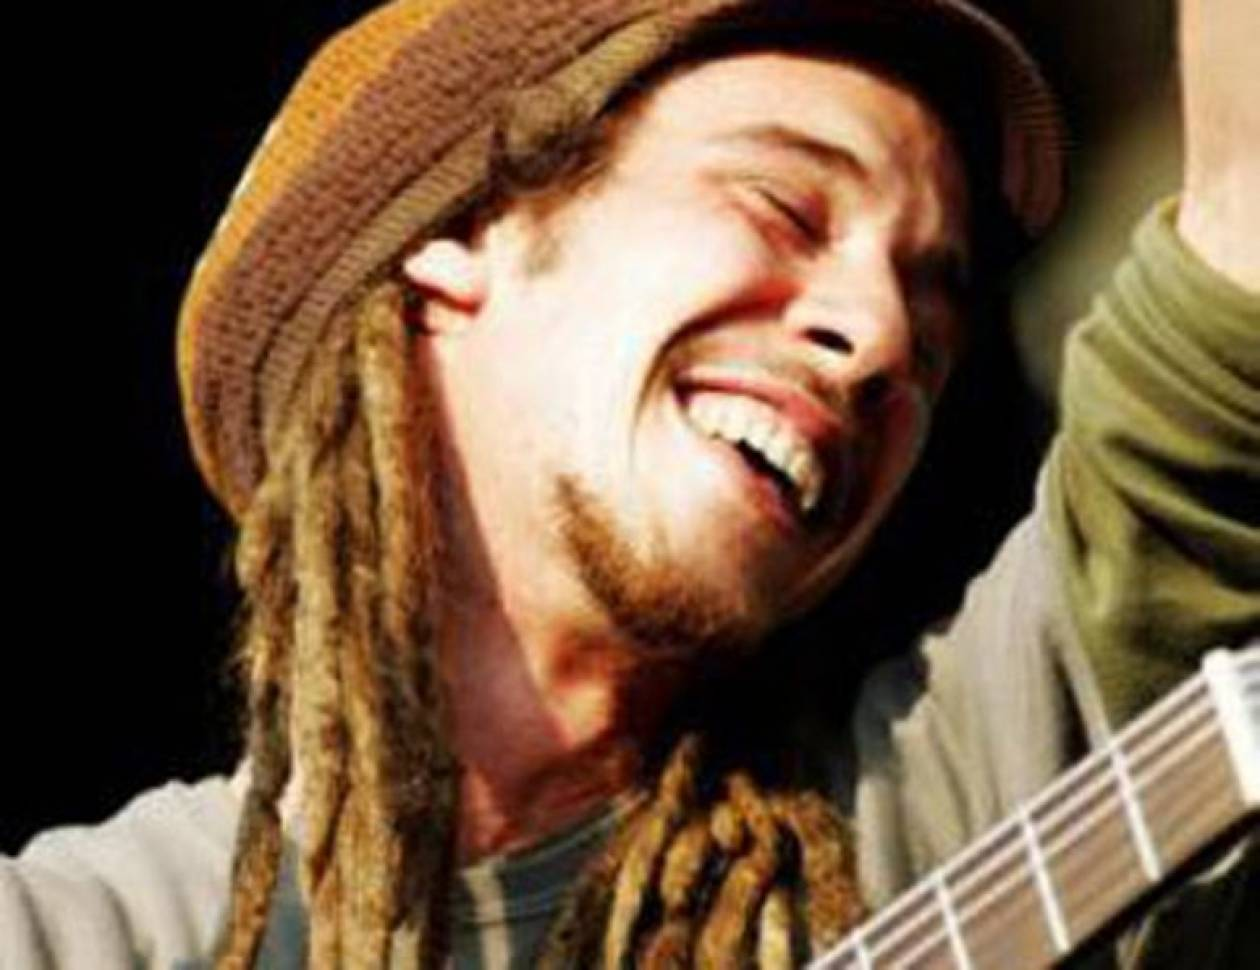 Bob Marley Tribute σε Αθήνα, Θεσσαλονίκη, Κρήτη και Λάρισα